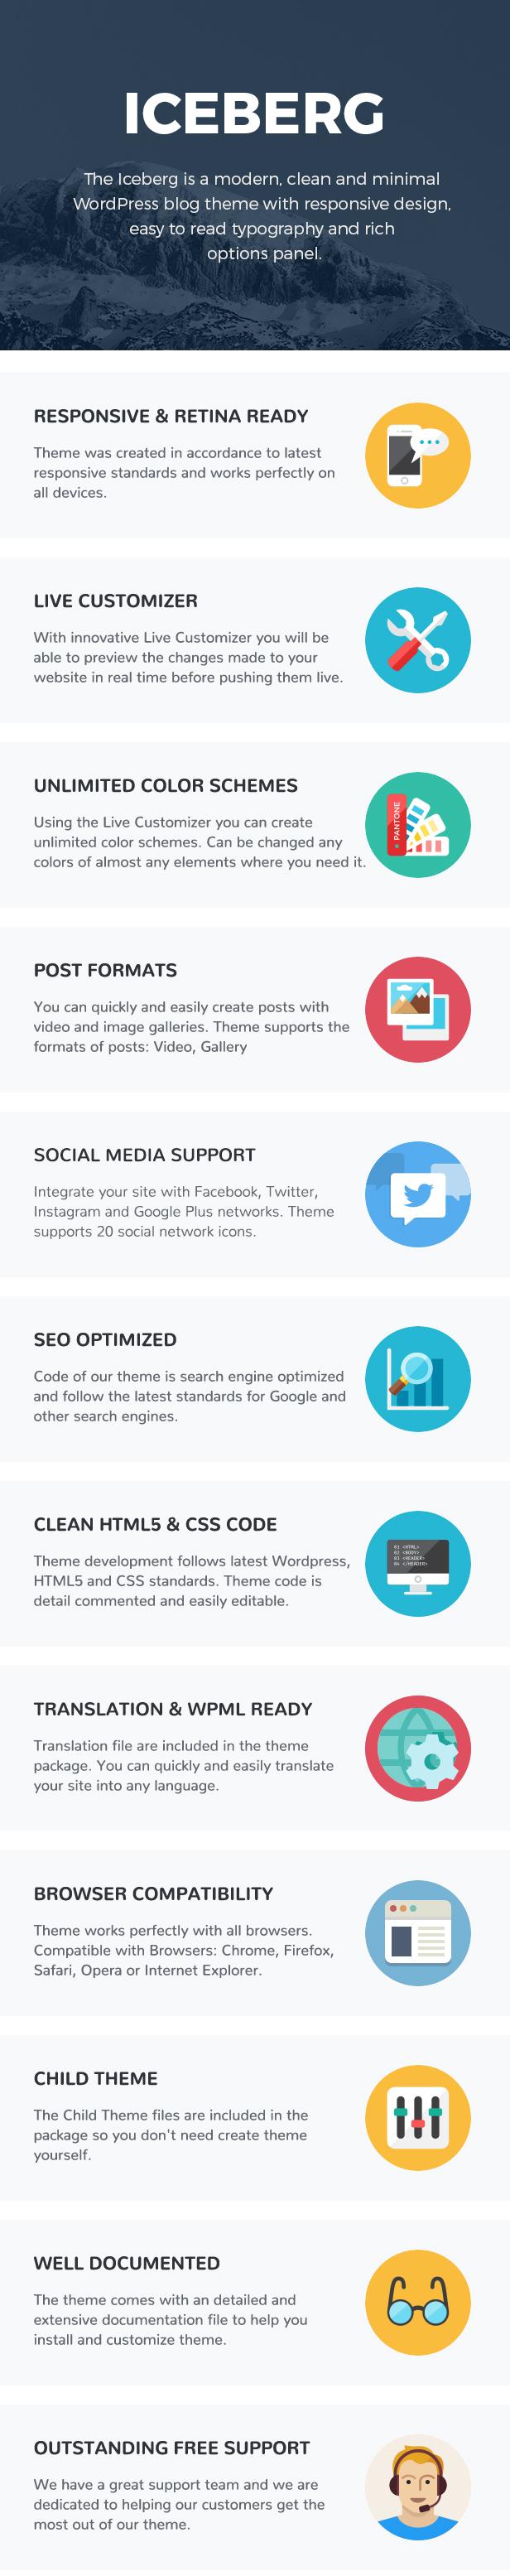 Iceberg - Simple & Minimal Personal Wordpress Blog Theme - 2